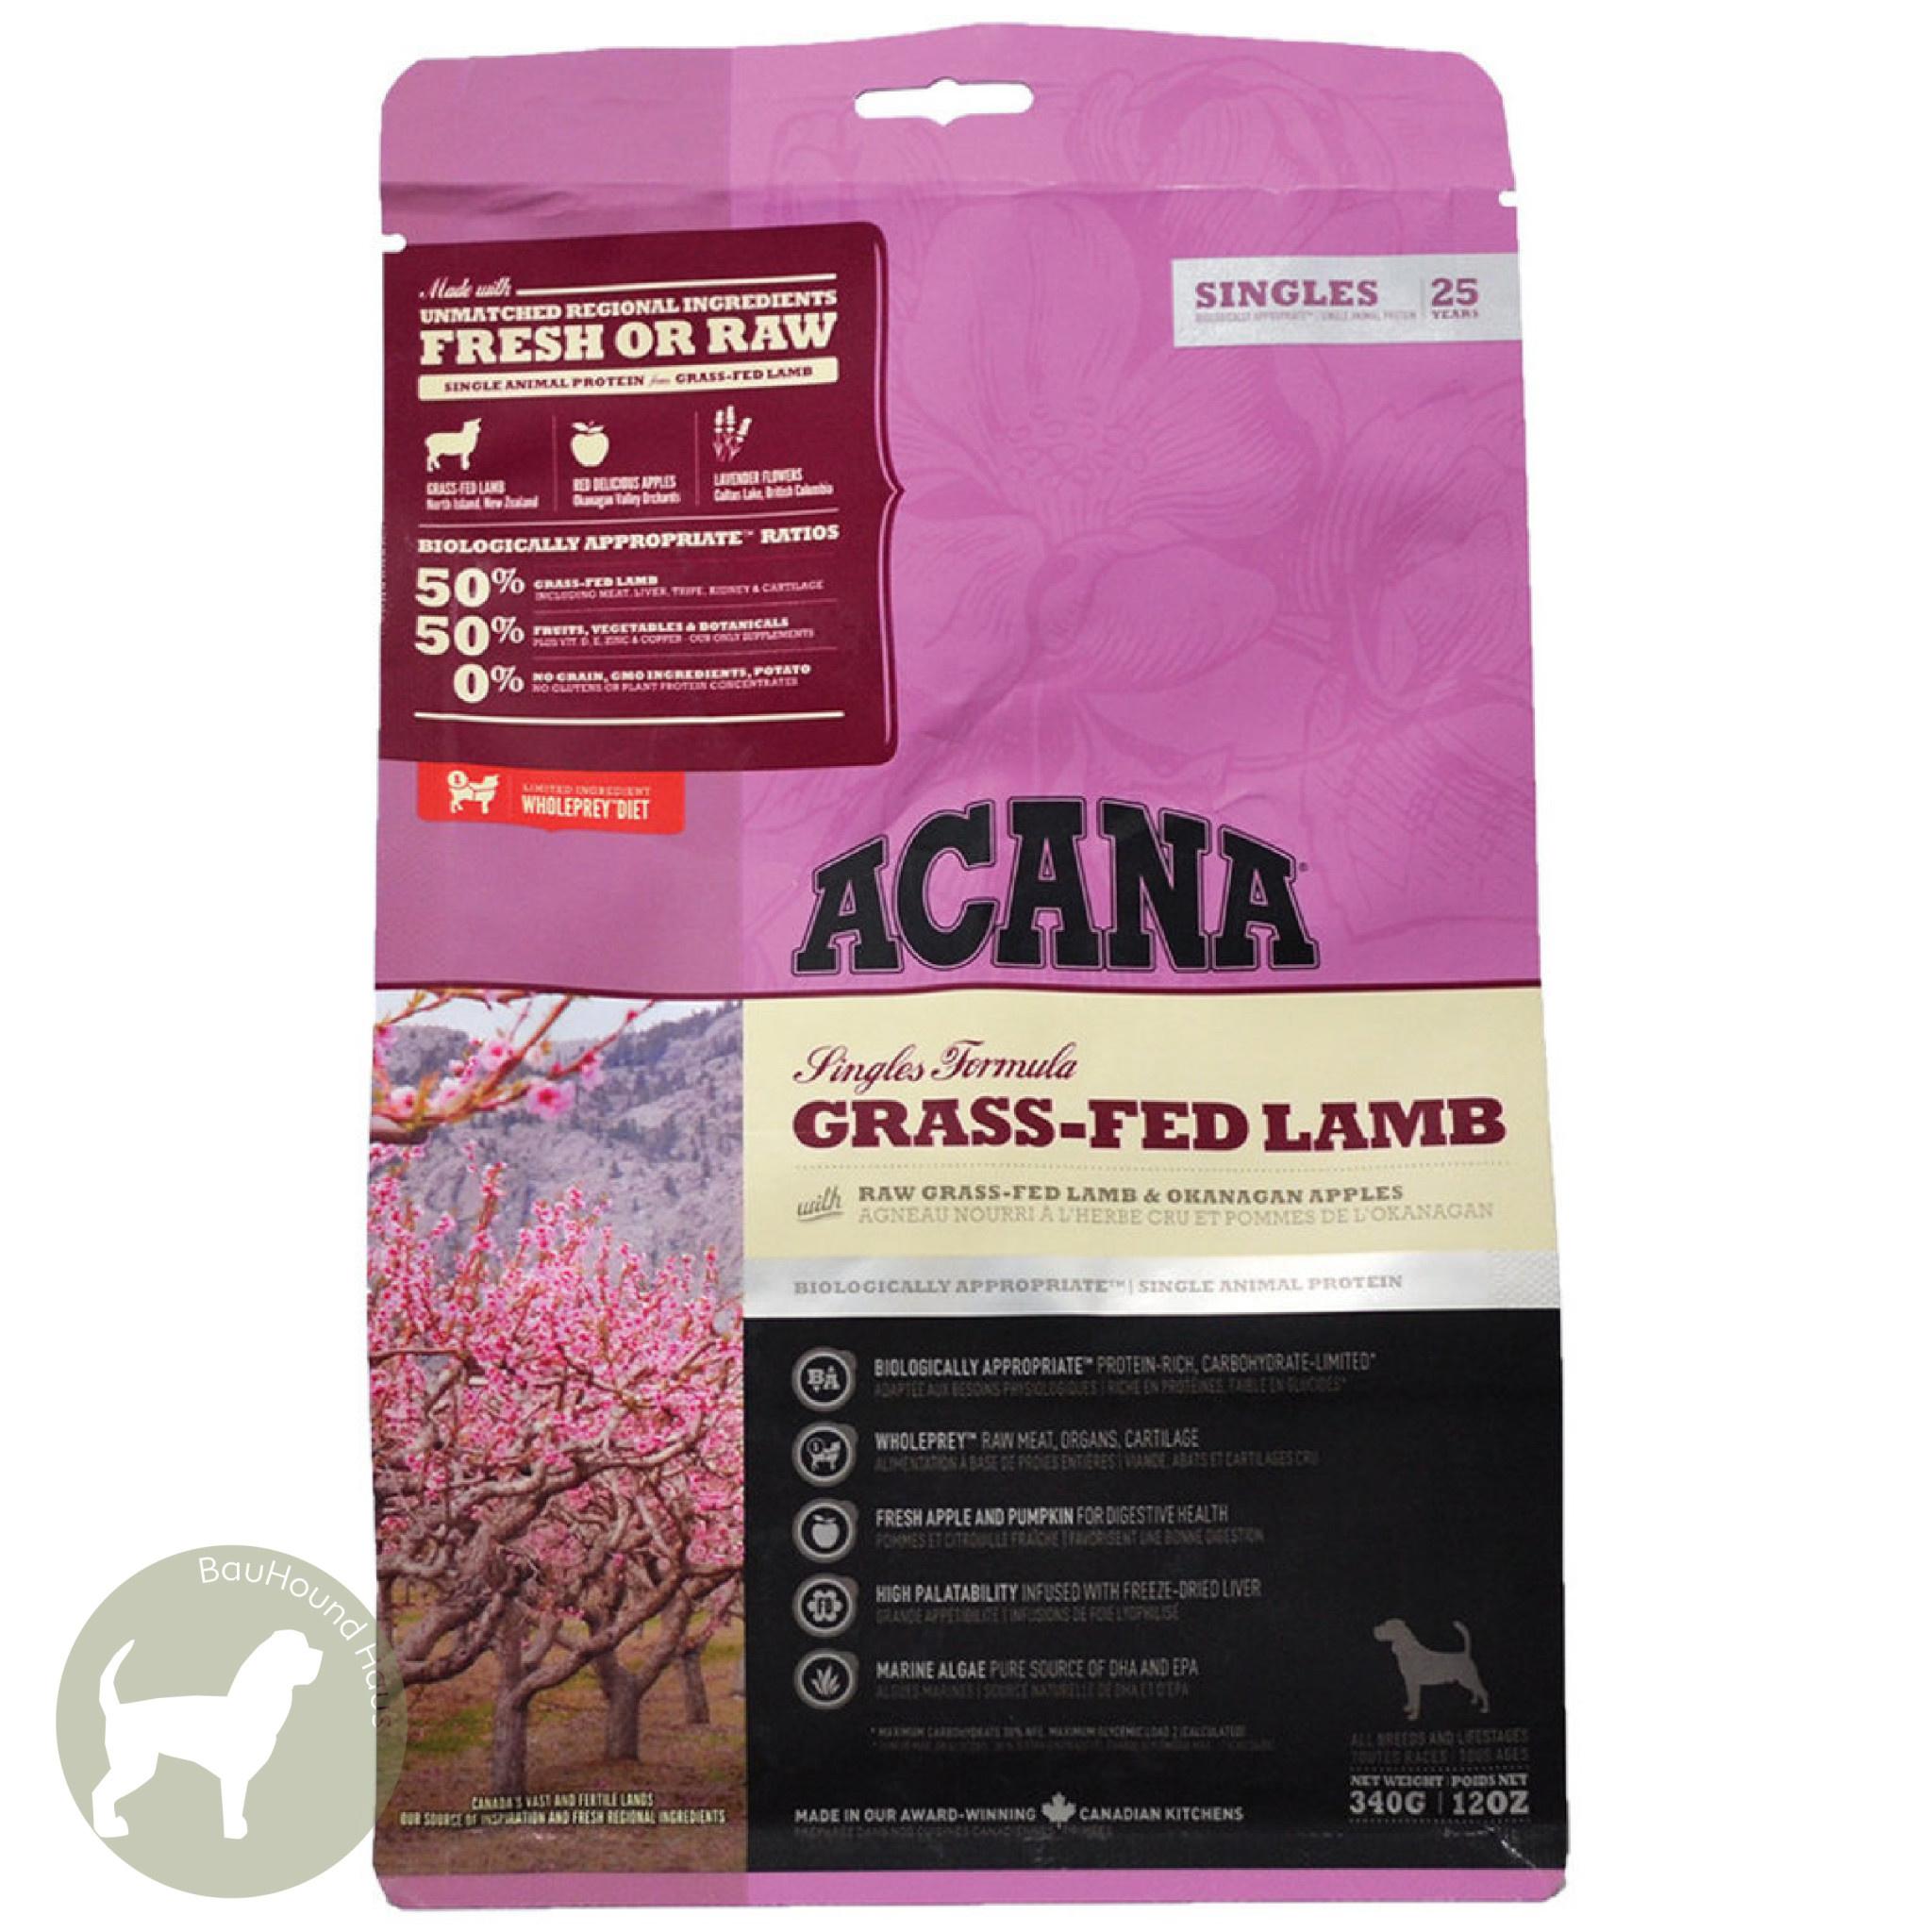 Acana Acana SINGLES Grain Free Grass Fed Lamb Kibble, 11.4kg